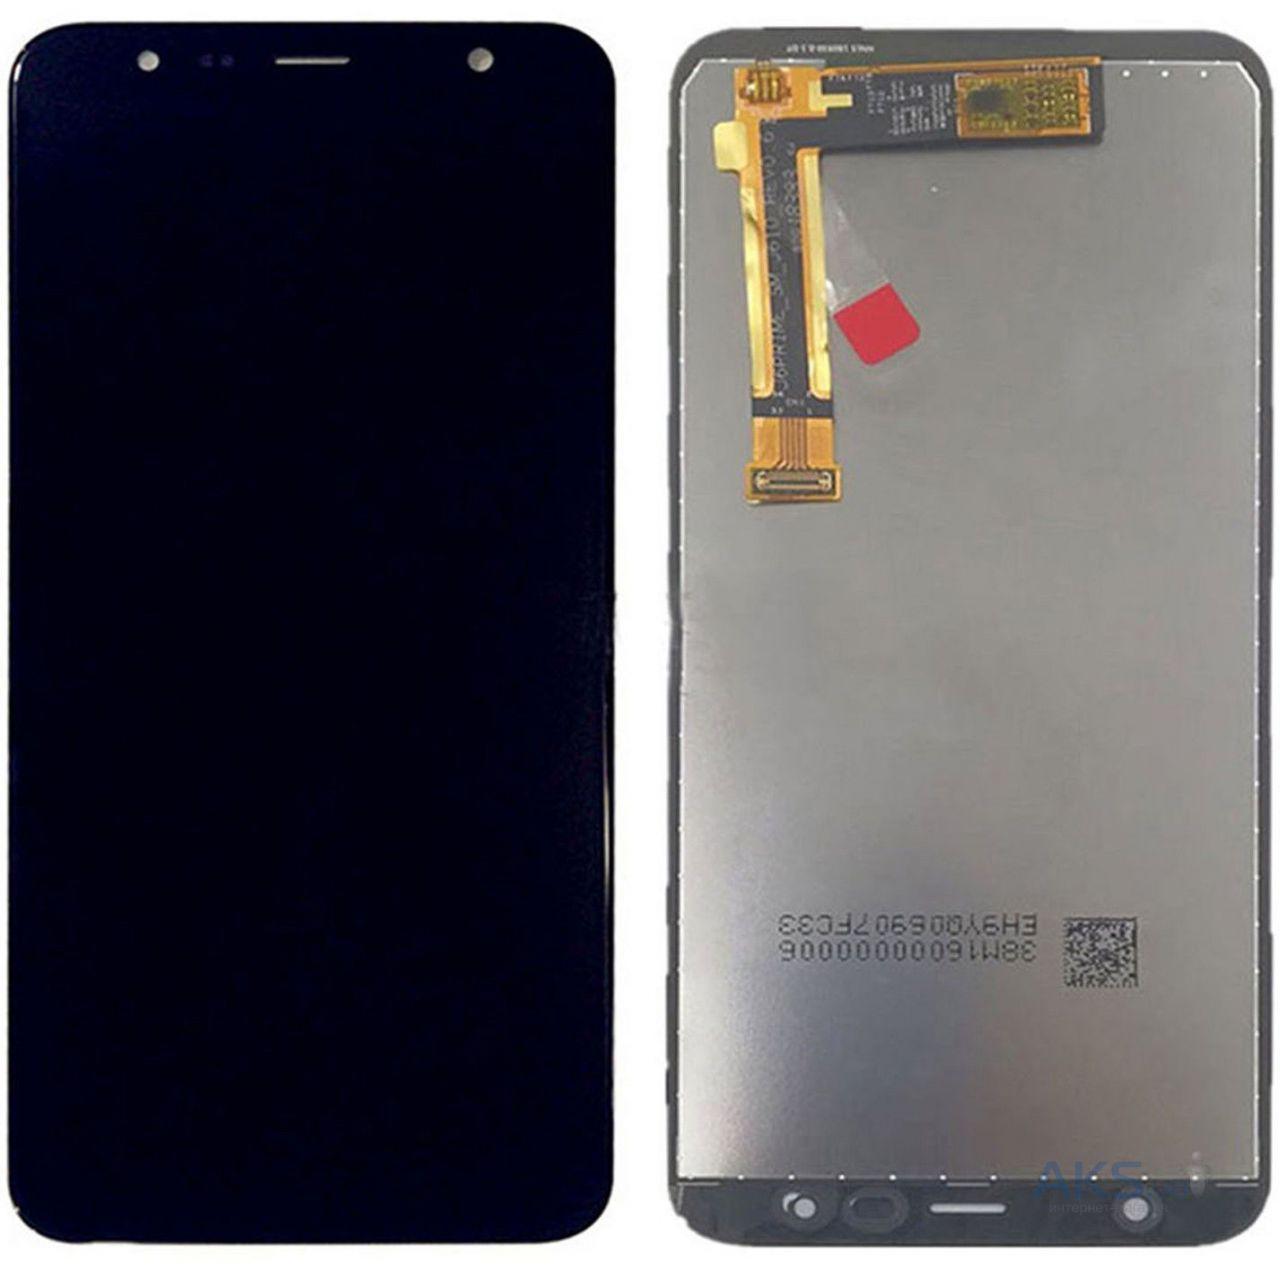 e7be2333bb8ec Дисплей (экран) для телефона Samsung Galaxy J4 Plus J415F + Touchscreen  Original Black, цена 1 339 грн., купить в Киеве — Prom.ua (ID#901690723)